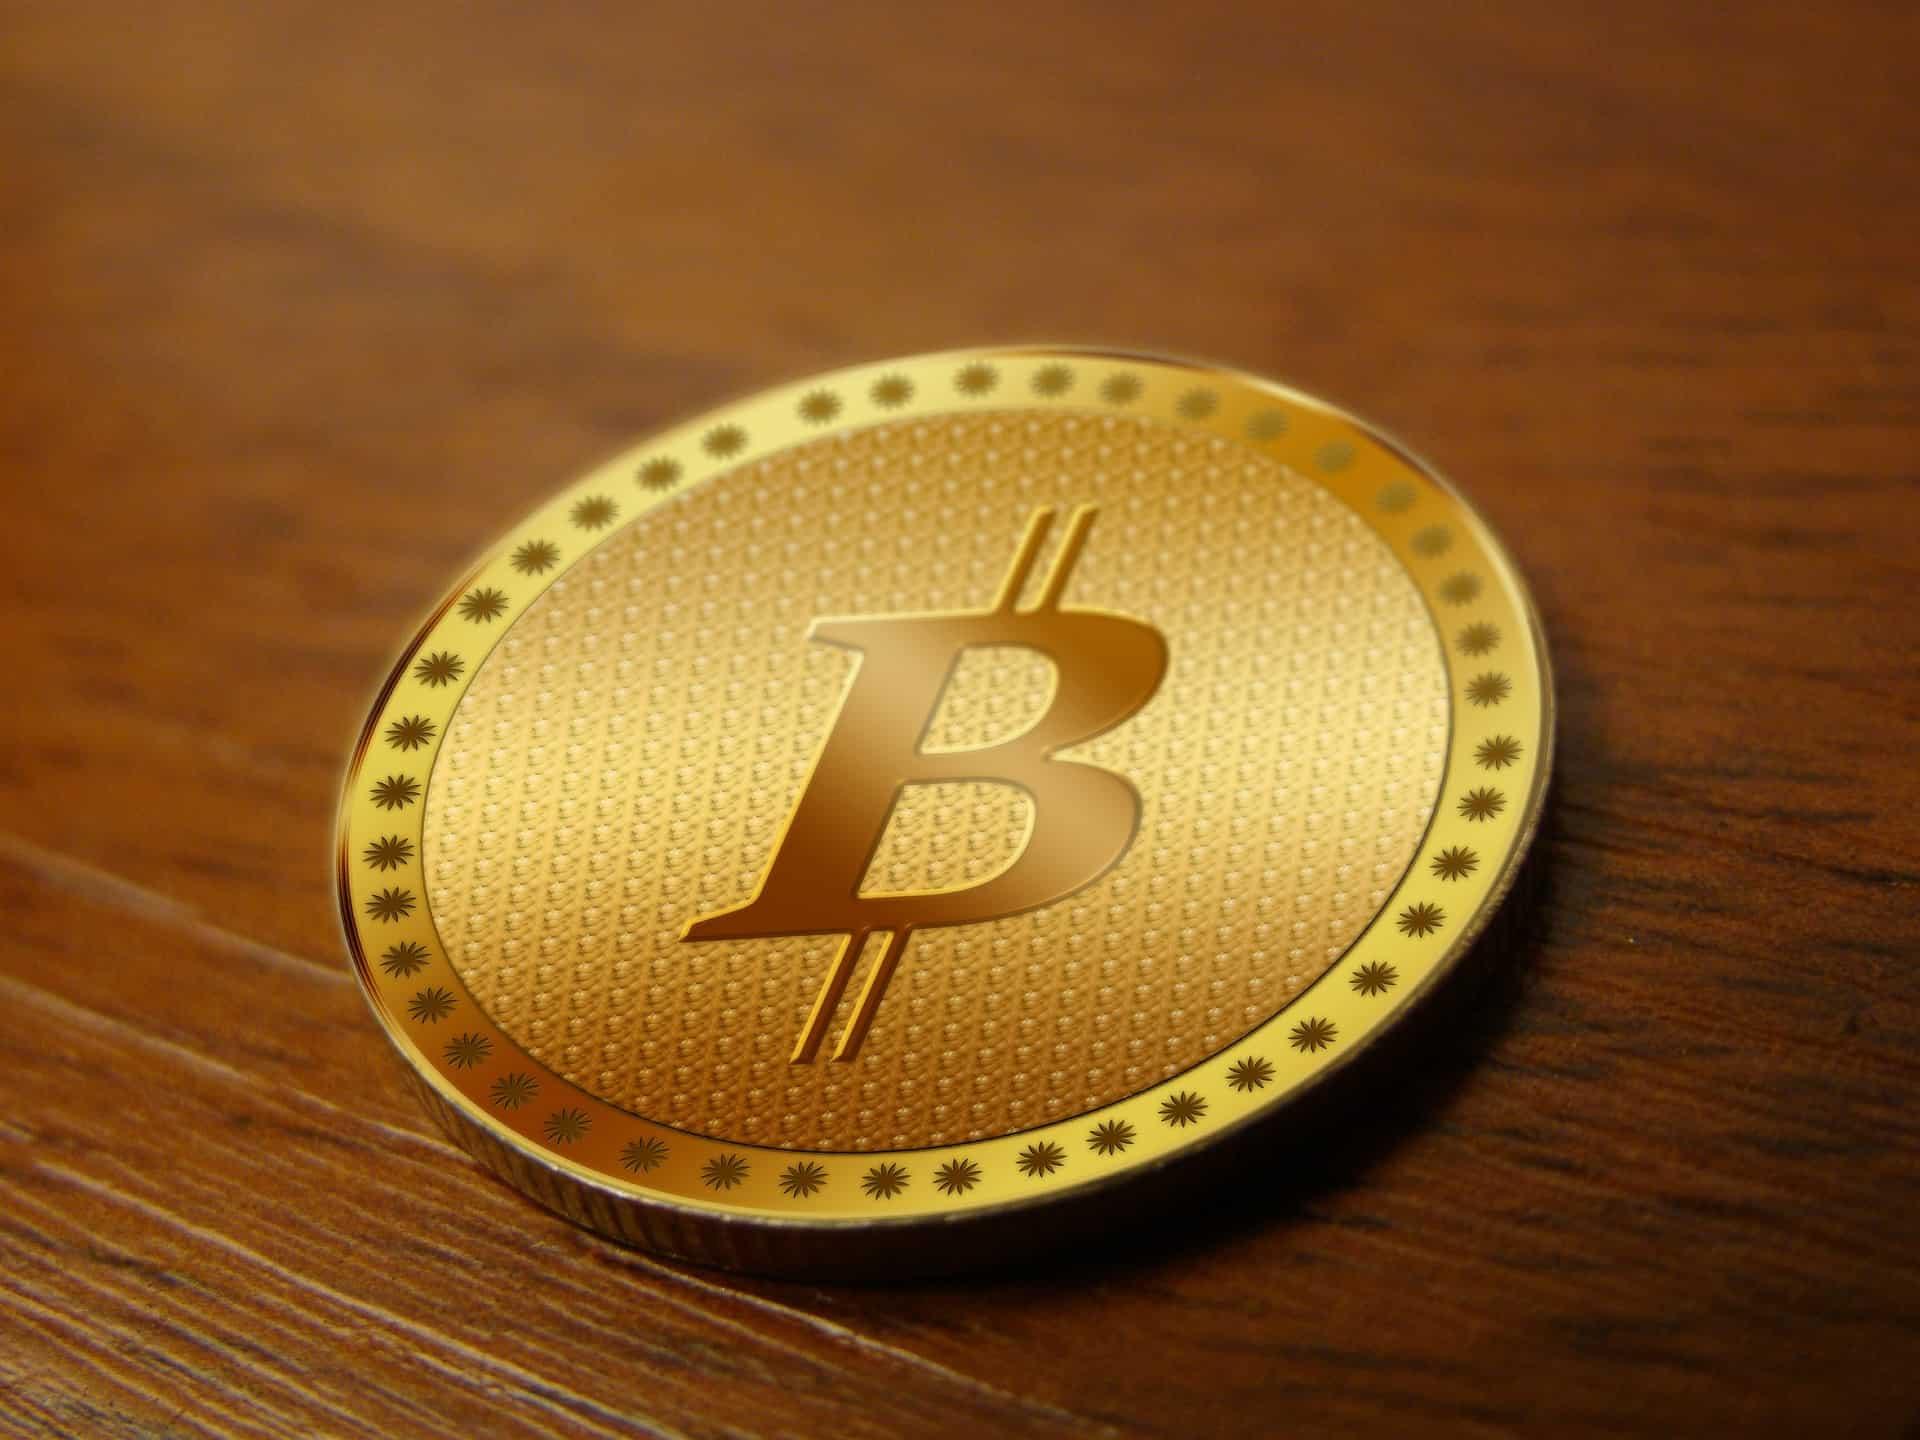 New Estimate Suggests That Nakamoto Mined Bitcoin worth $10.5 Billion